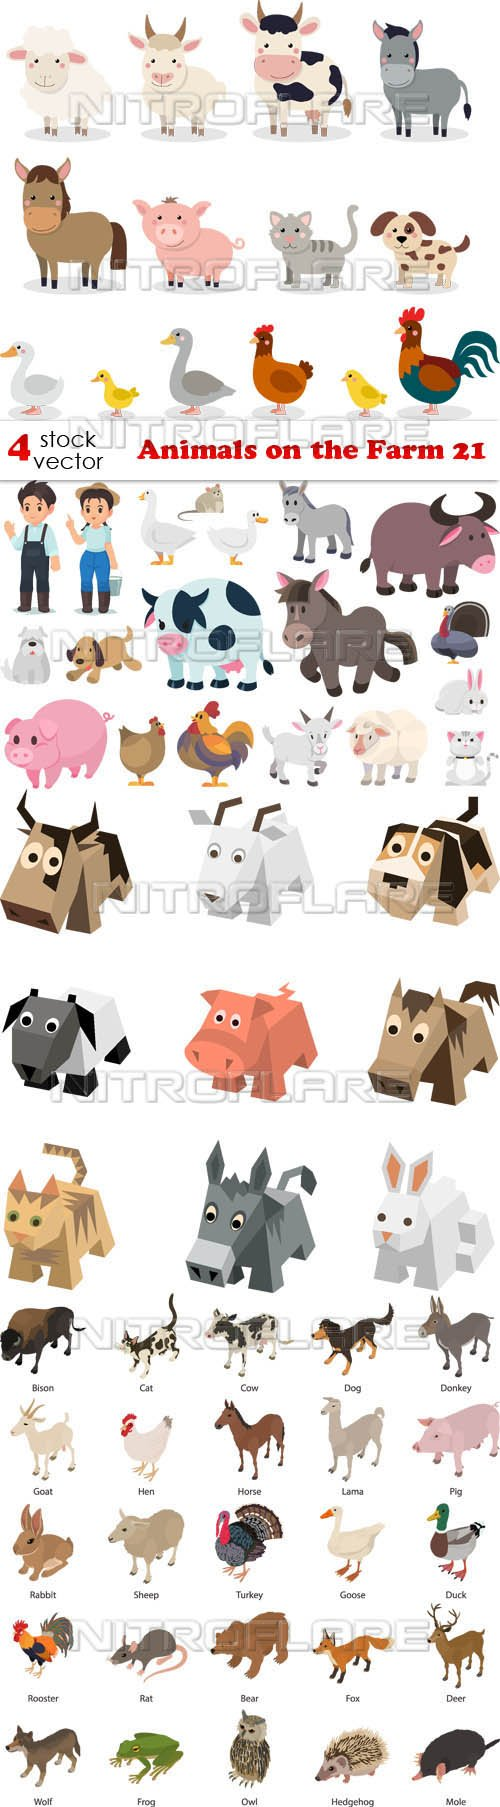 Vectors - Animals on the Farm 21